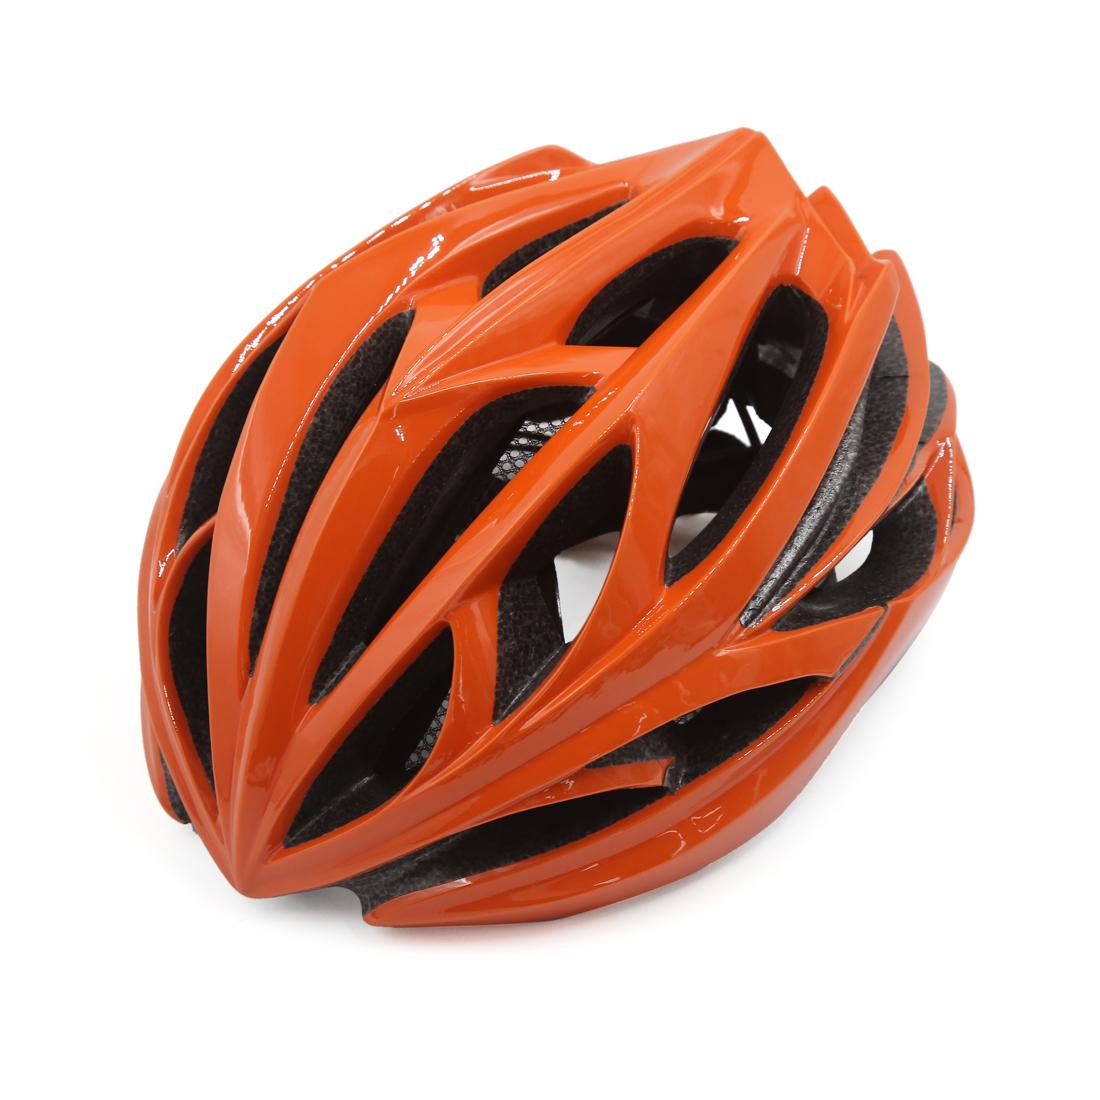 Unisex Adult MTB Mountain Bike Bicycle Cycling Shockproof Safety Helmet Orange